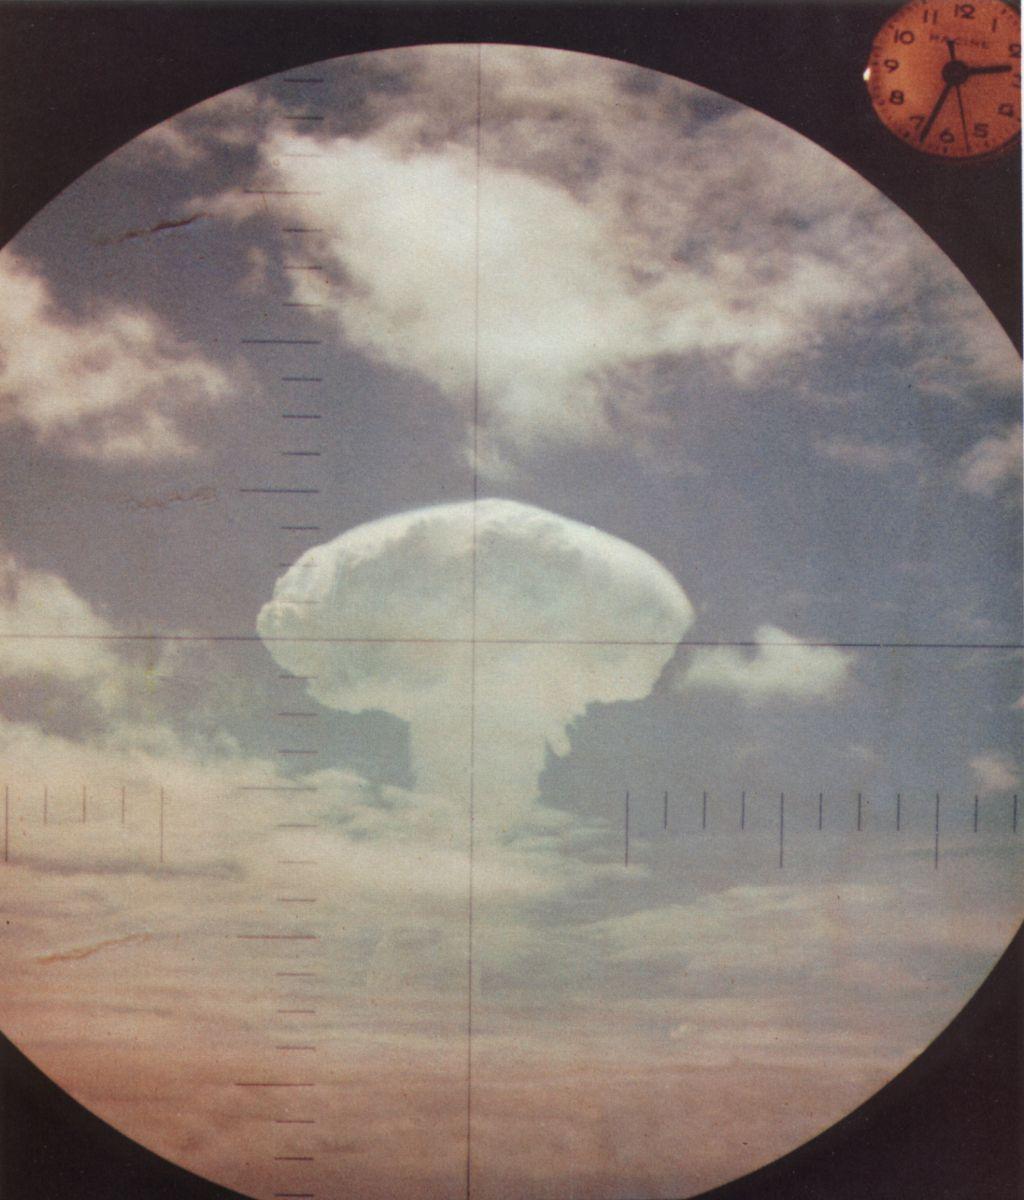 1962nuclearexplosionasseenthroughtheperiscopeofa..avysubmarine.hegoalofcontainmentwastocontaincommunismwithoutanuclearwar.